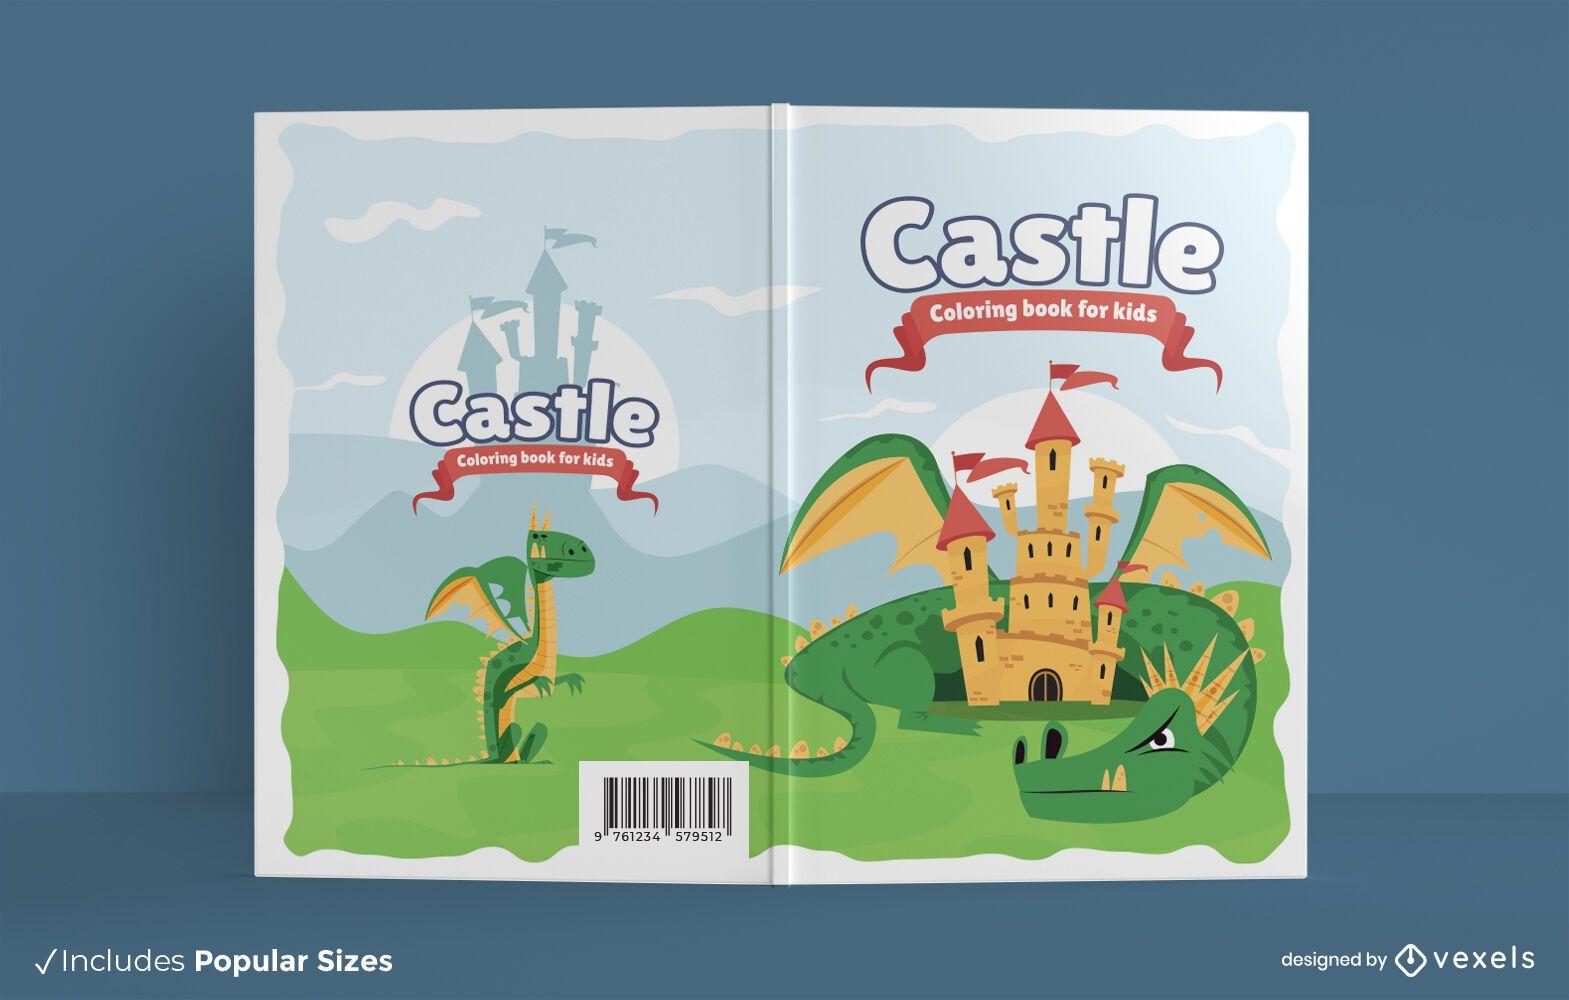 Castle coloring book cover design